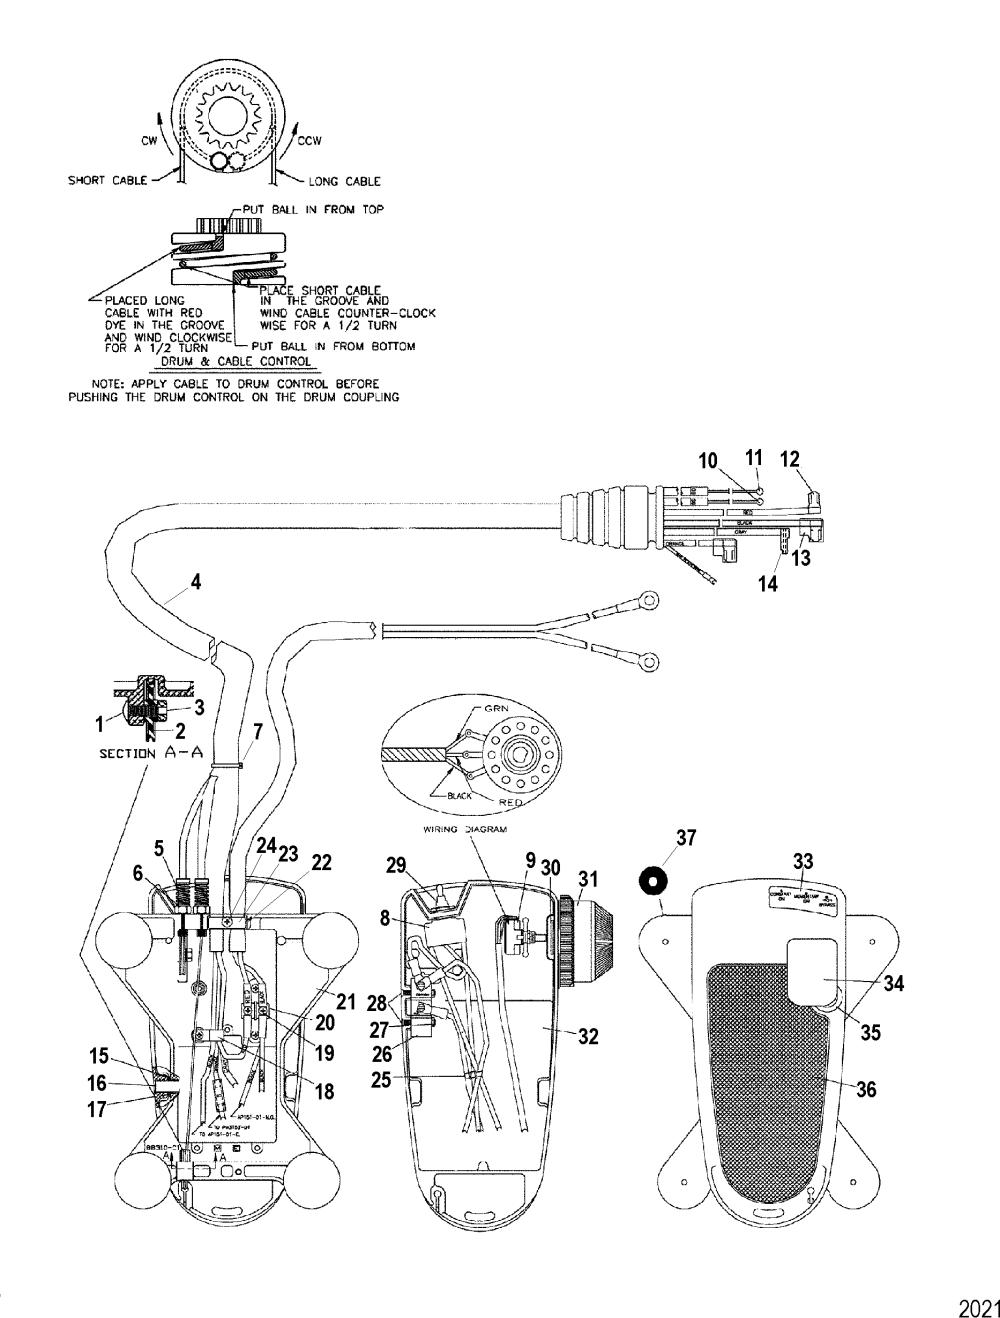 medium resolution of motorguide trolling motor diagram 3 wire